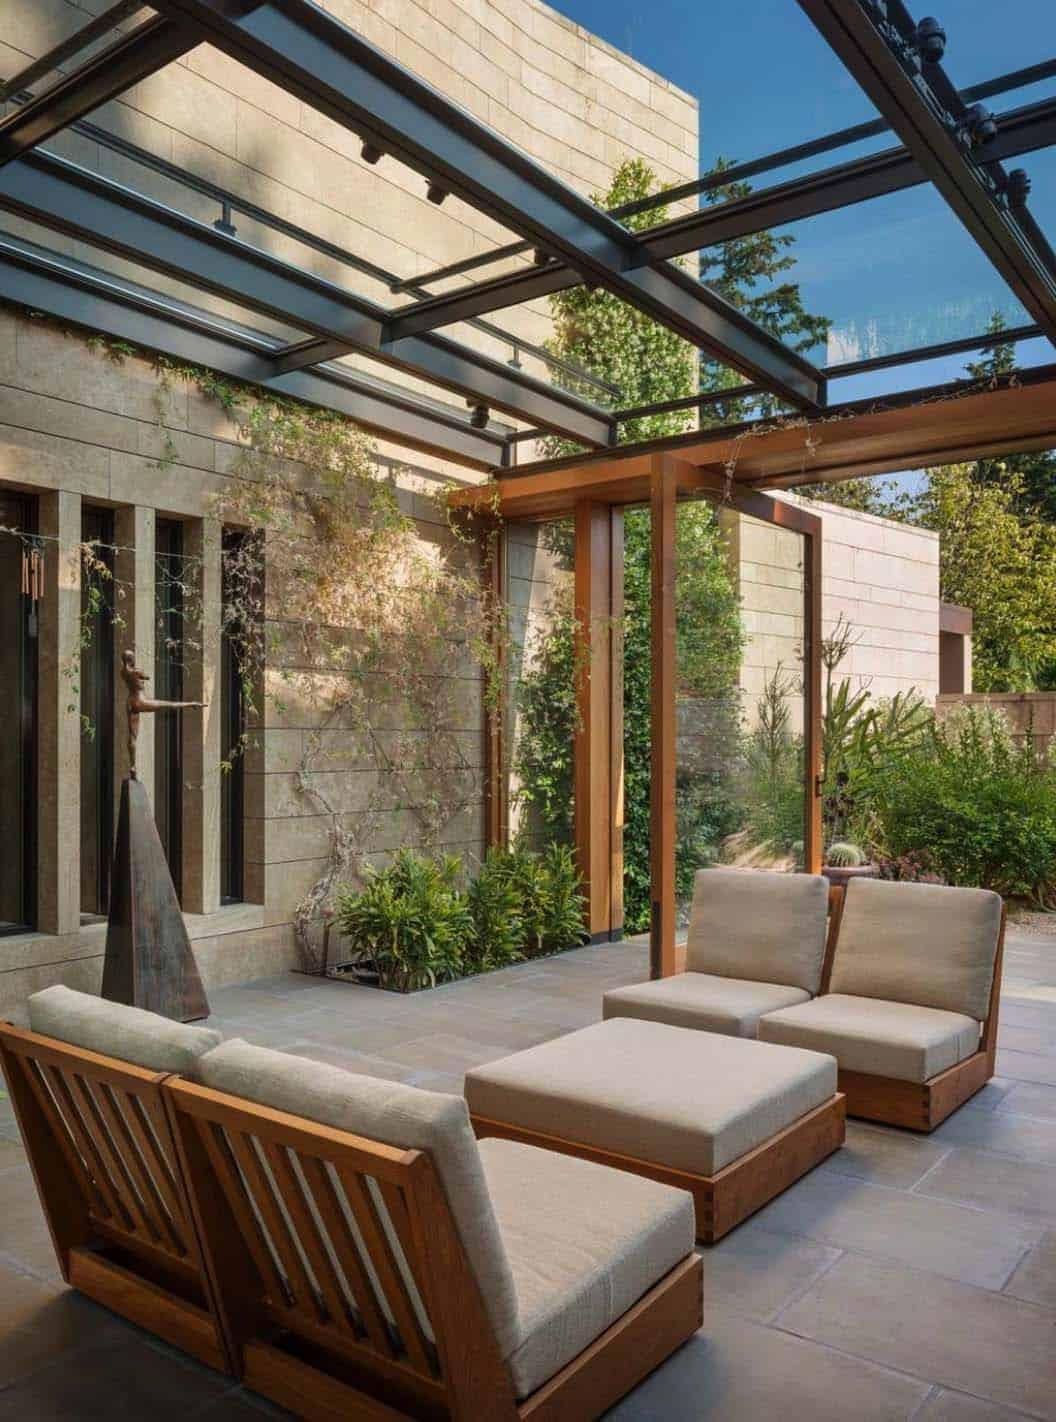 Amazing-Conservatory-Greenhouse-Ideas-20-1-Kindesign